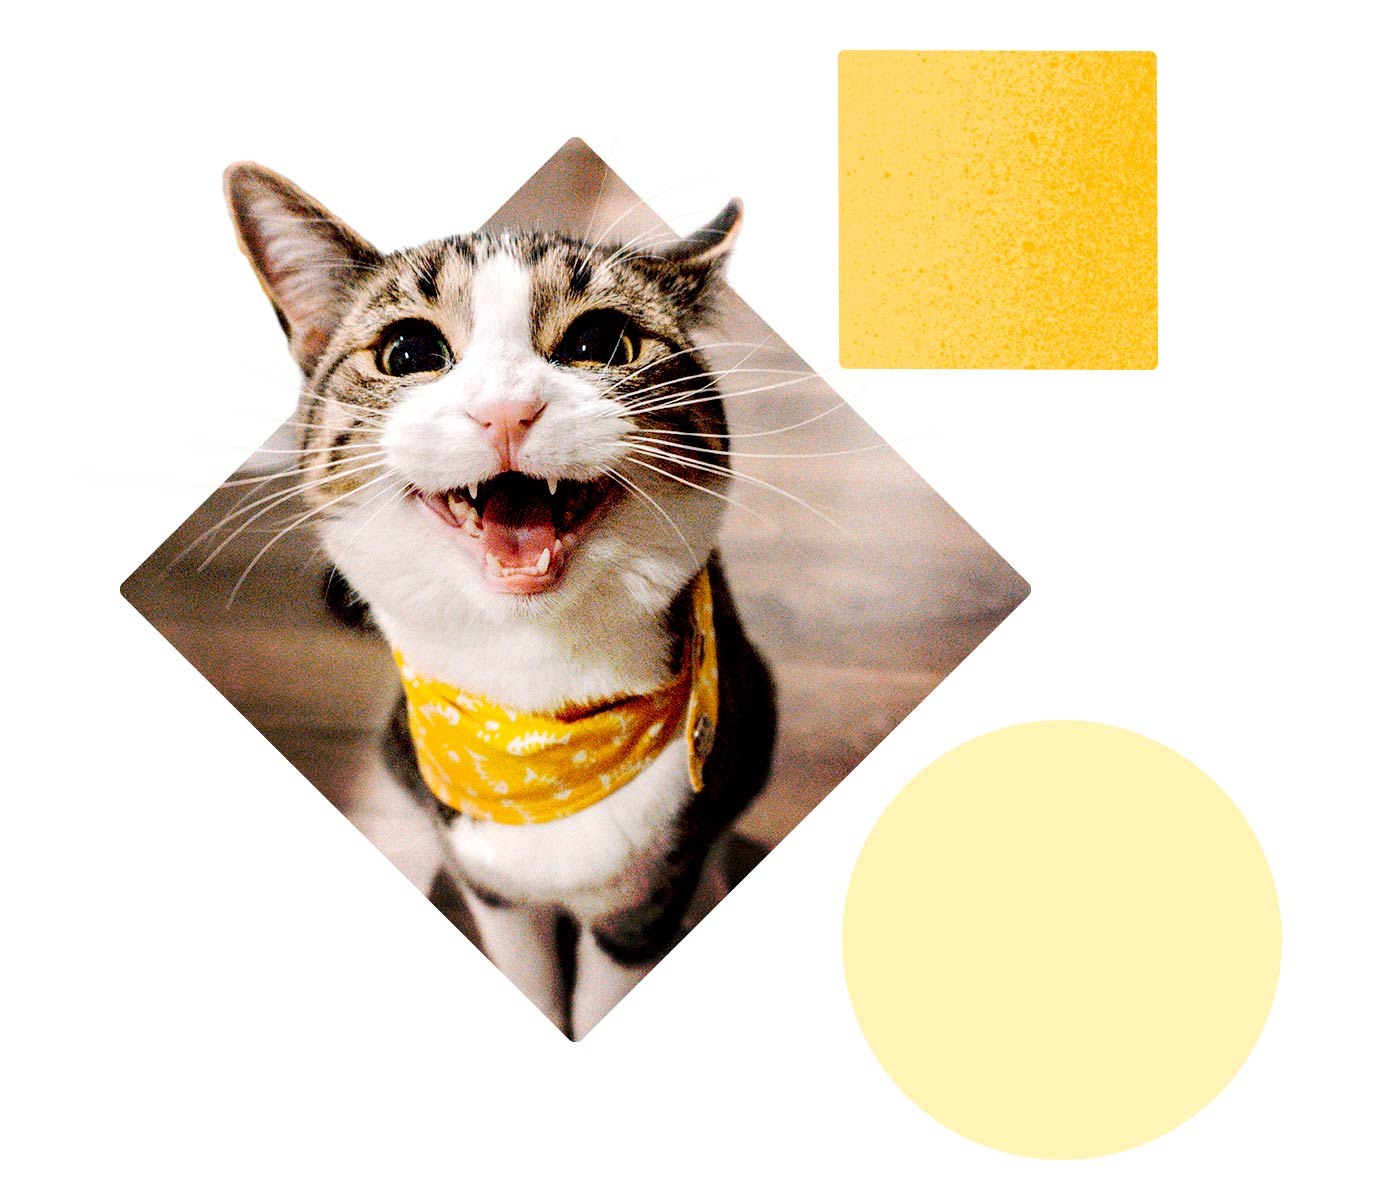 A cat grins at us wearing a yellow bandana.